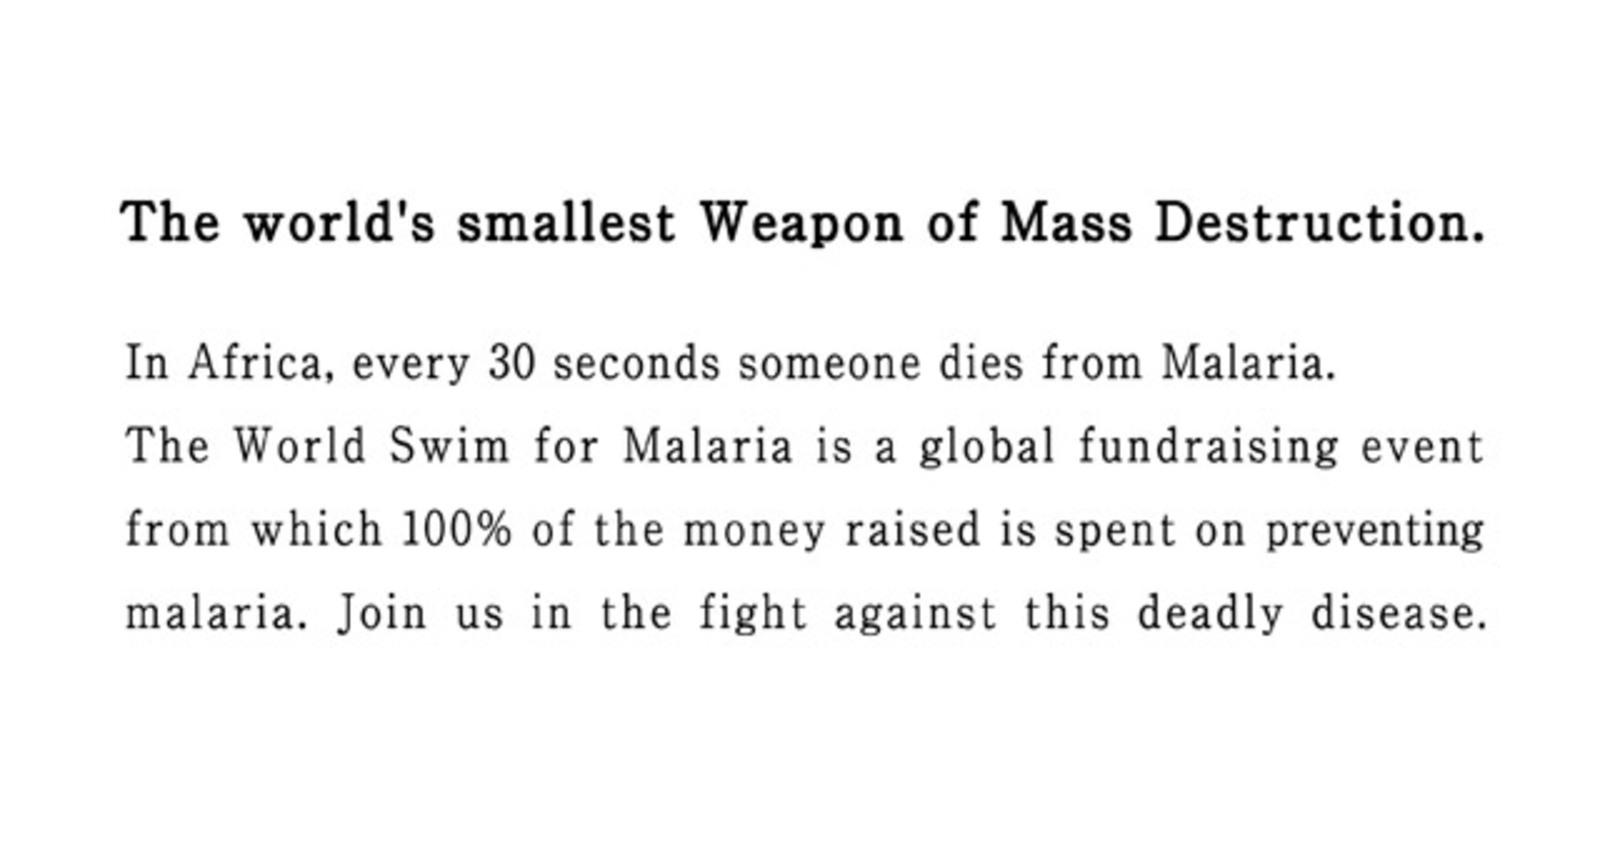 The World's Smallest Weapon of Mass Destruction